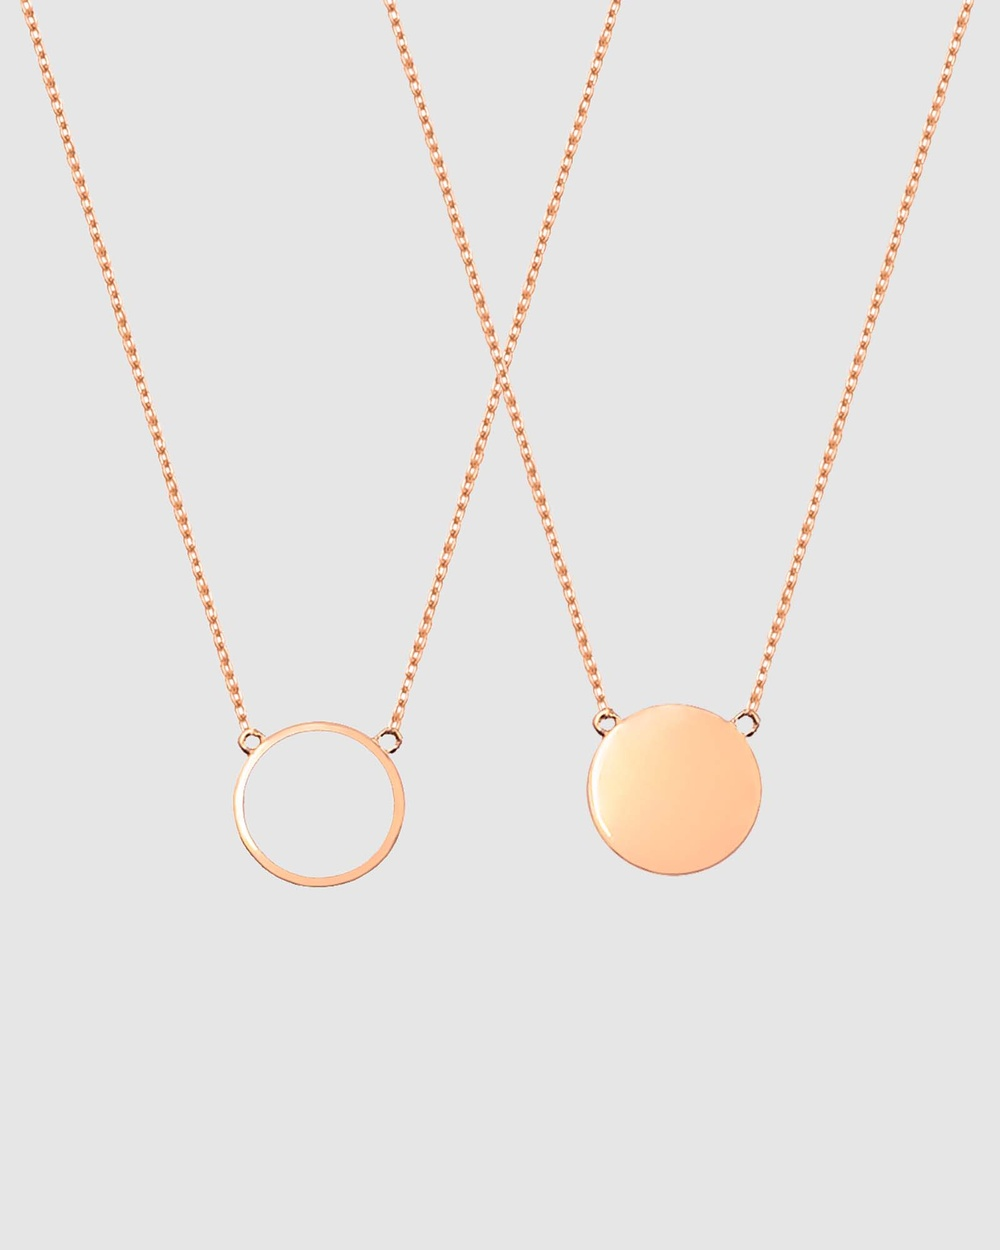 Secret Sisterhood Circle of Friendship Necklaces Jewellery Rose Gold